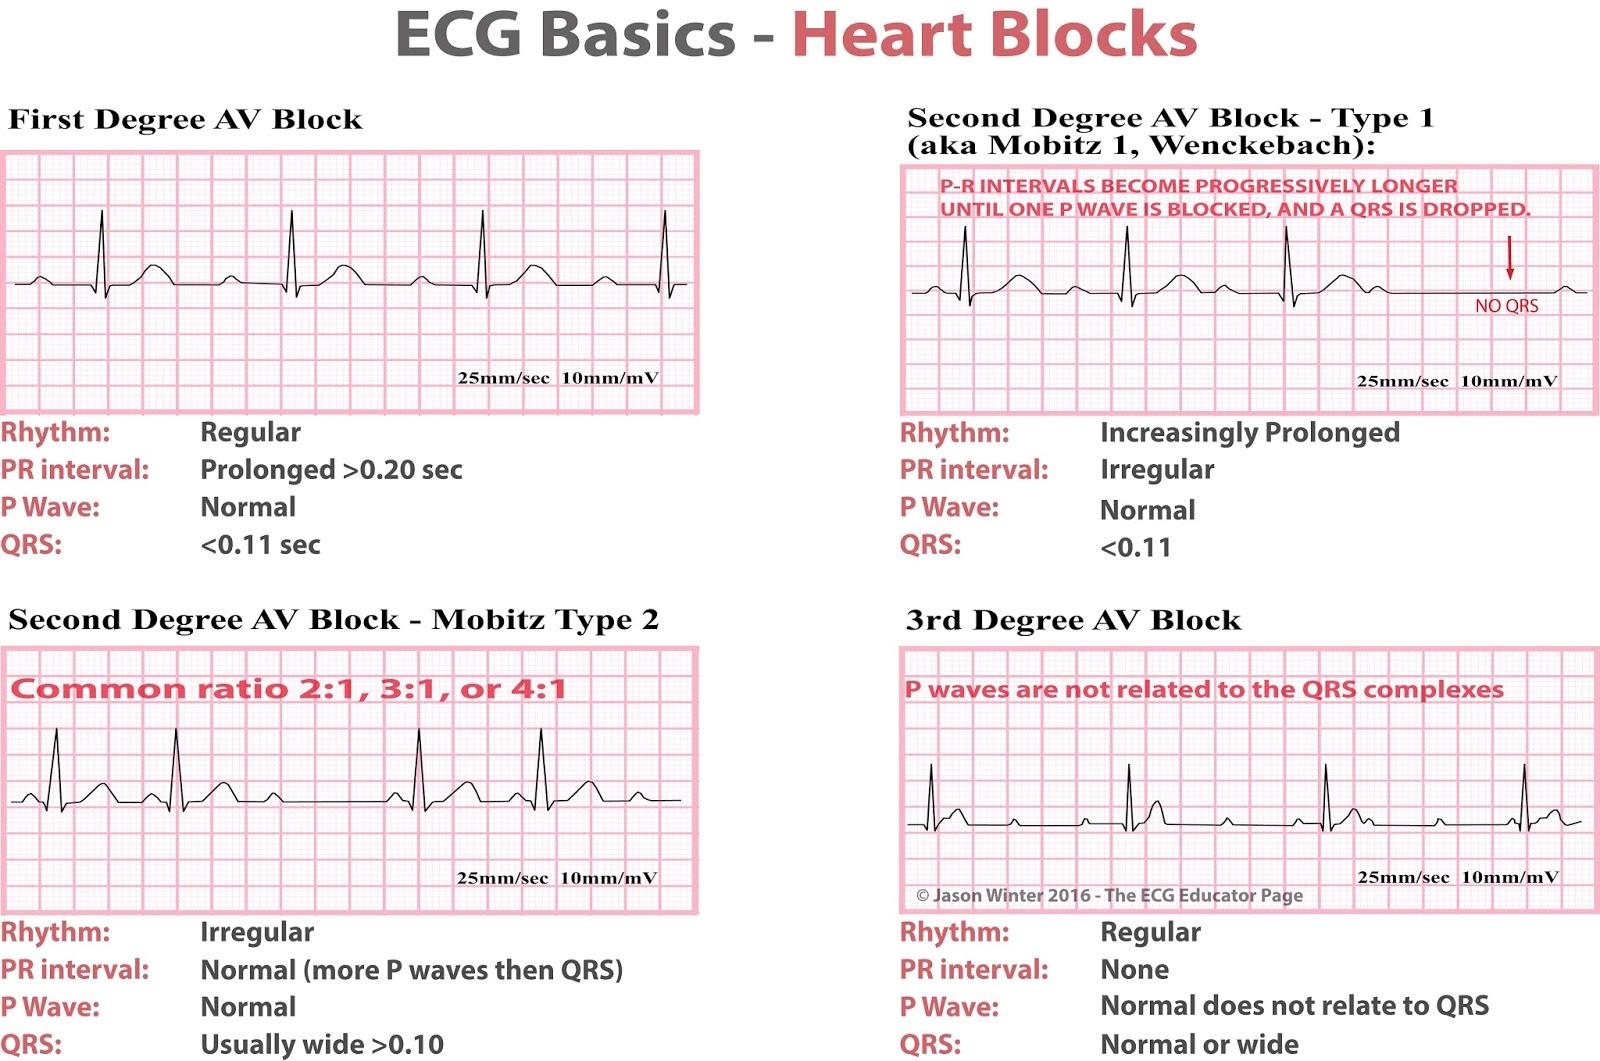 Heart Block Ekg Diagram Wiring Electricity Basics 101 Ecg Blocks Diagnosis Cardiology Medstudent Rh Grepmed Com Different Types Of Abnormal